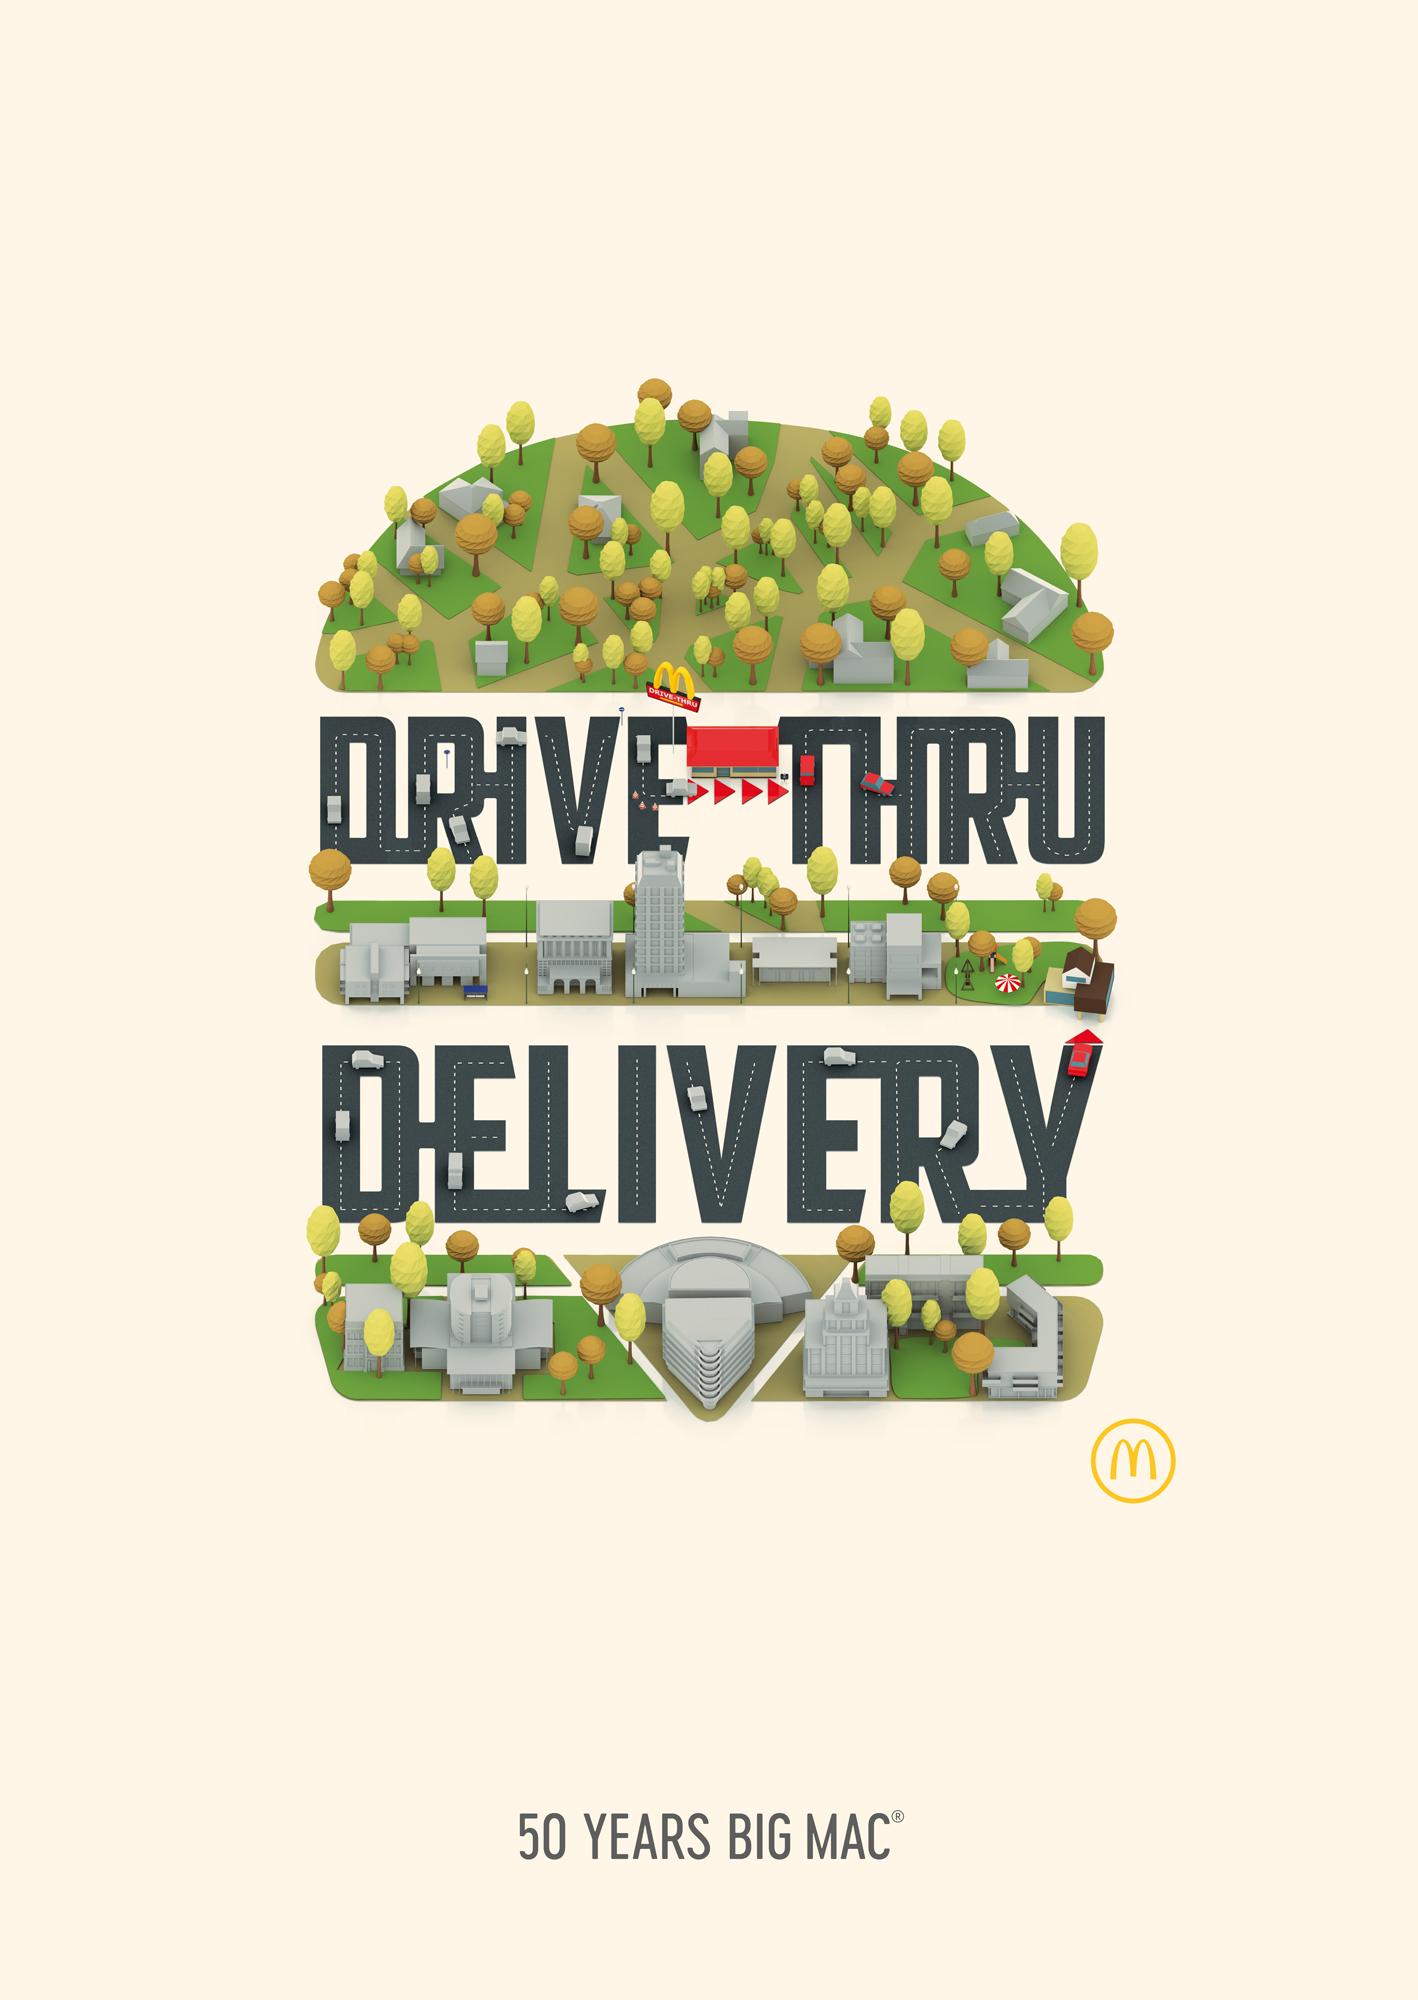 14_Drive-Thru_Delivery.jpg